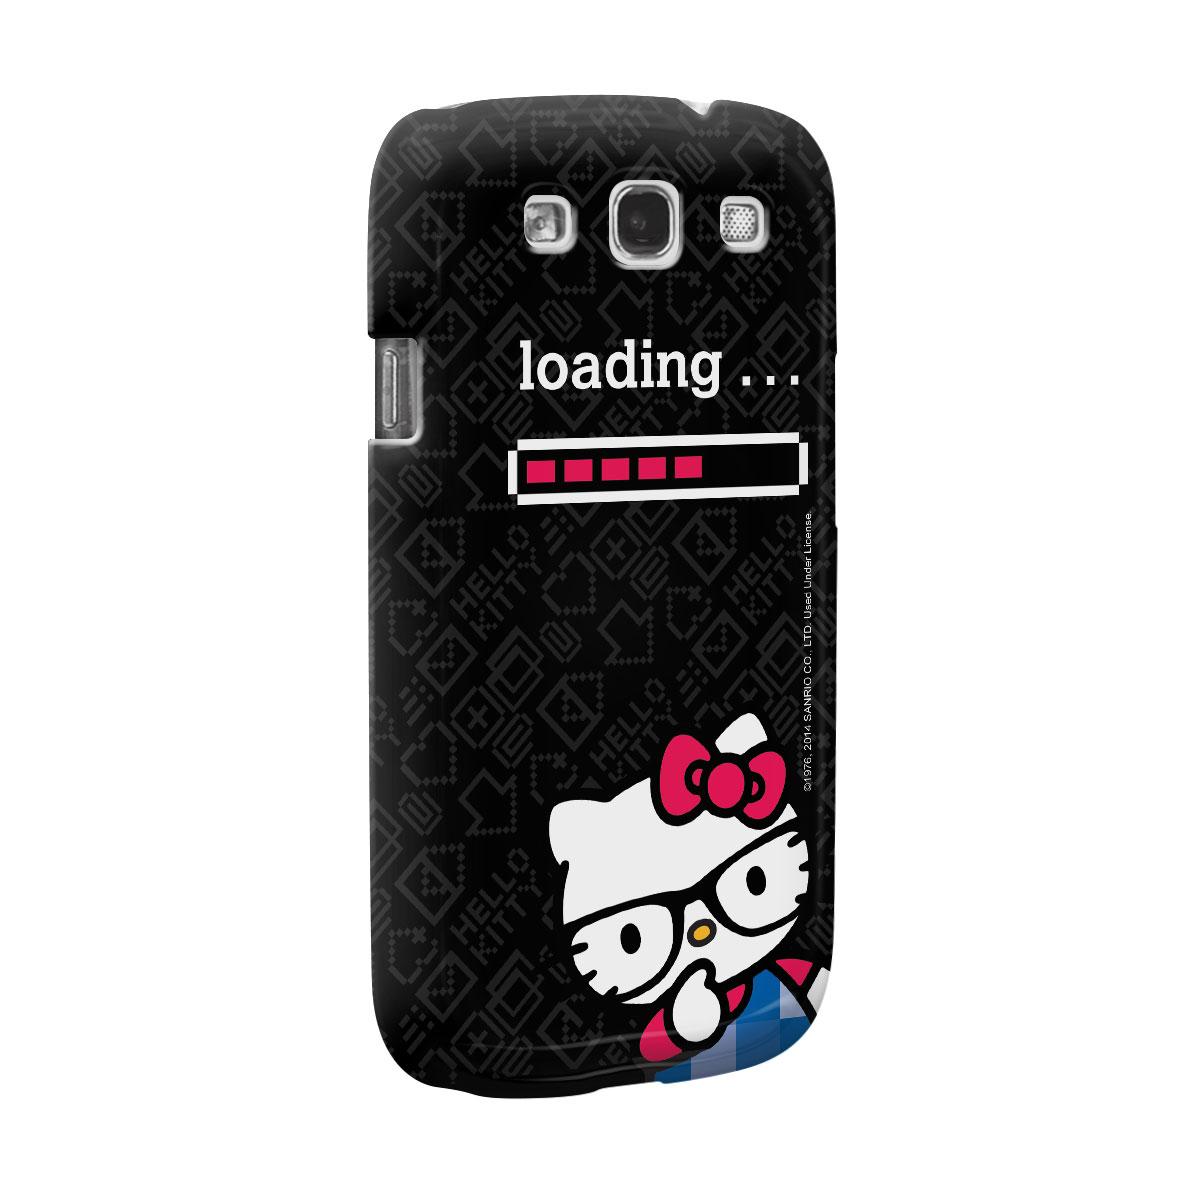 Capa de Celular Samsung S3 Hello Kitty Loading